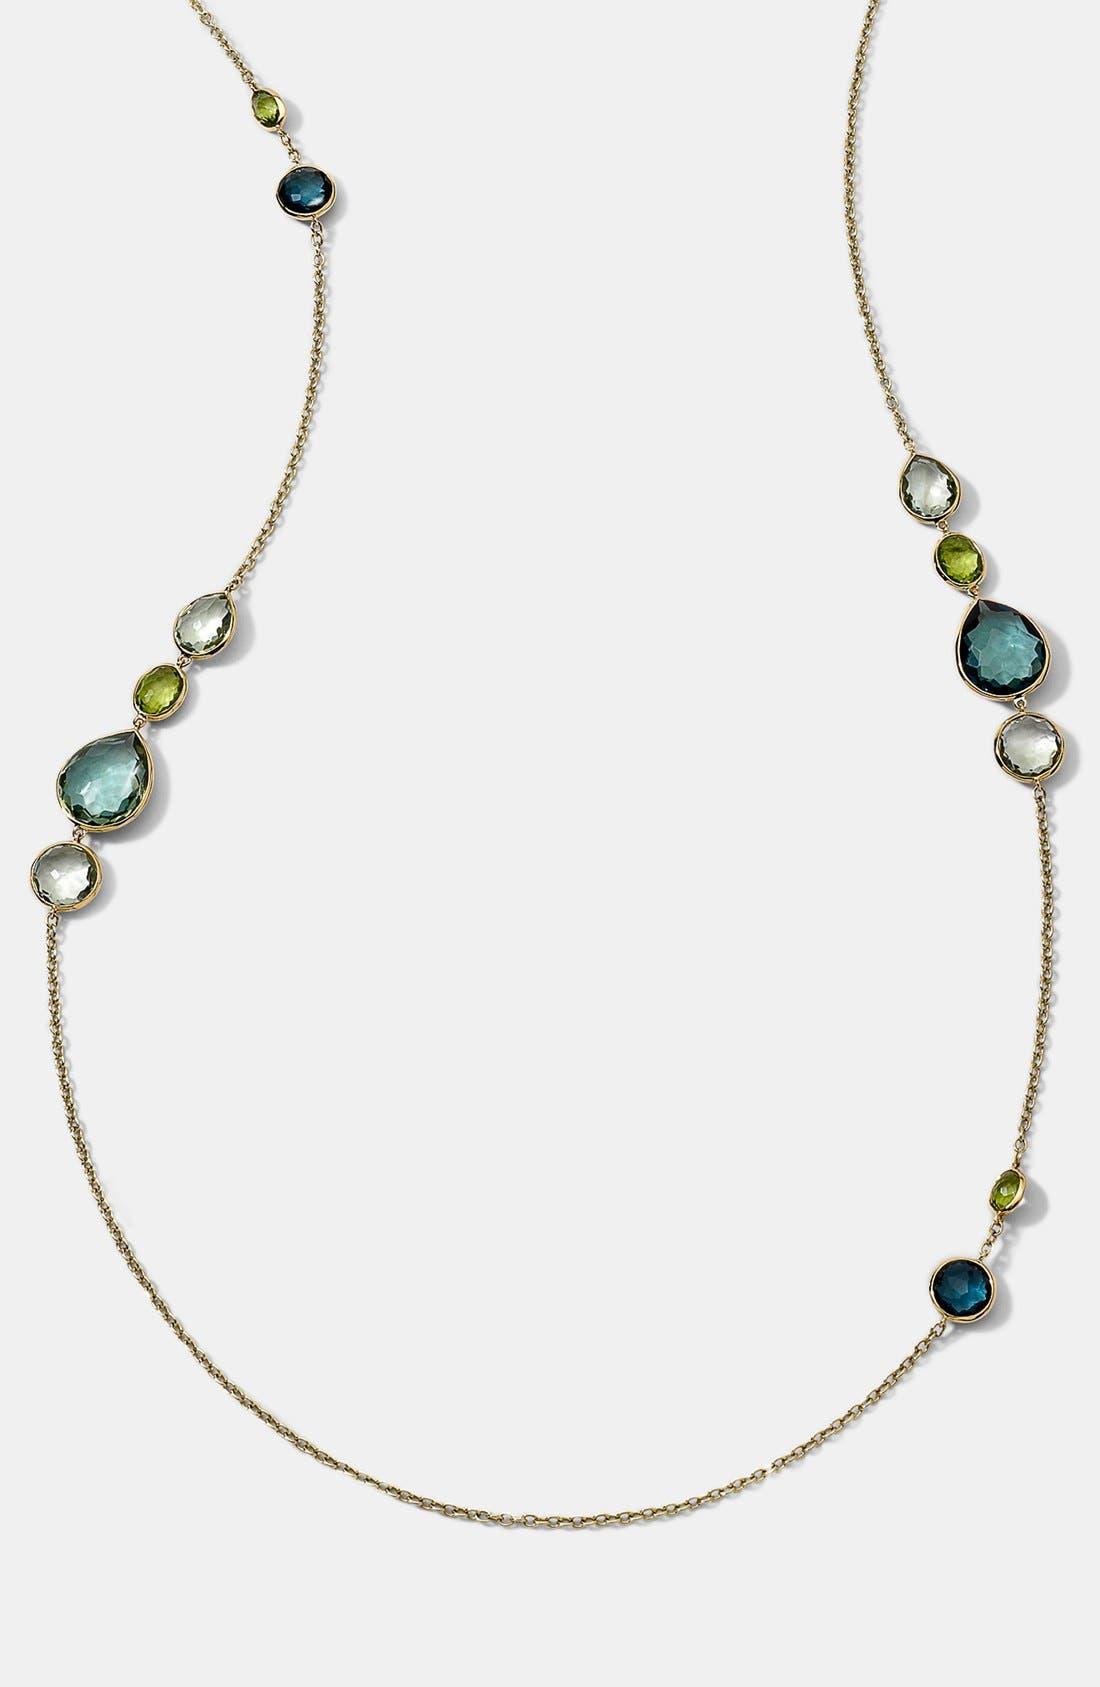 Main Image - Ippolita 'Rock Candy - Gelato' 18k Gold Long Station Necklace